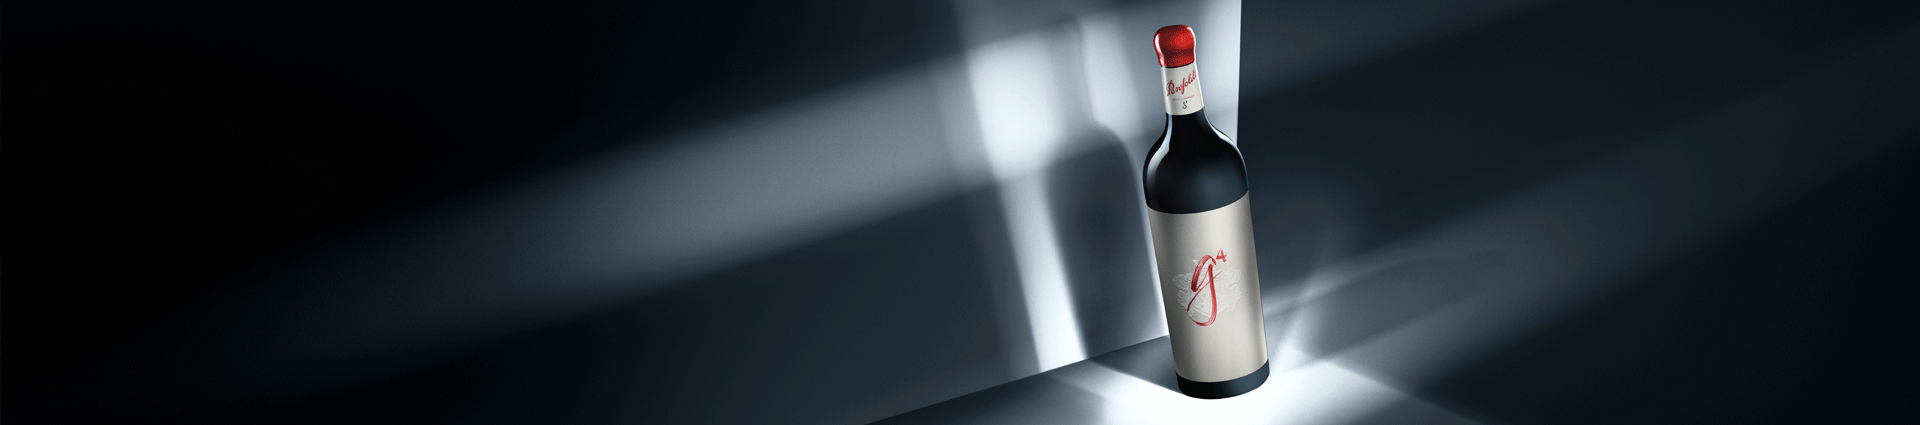 Penfolds g4 bottles for Ben Simmonds filming